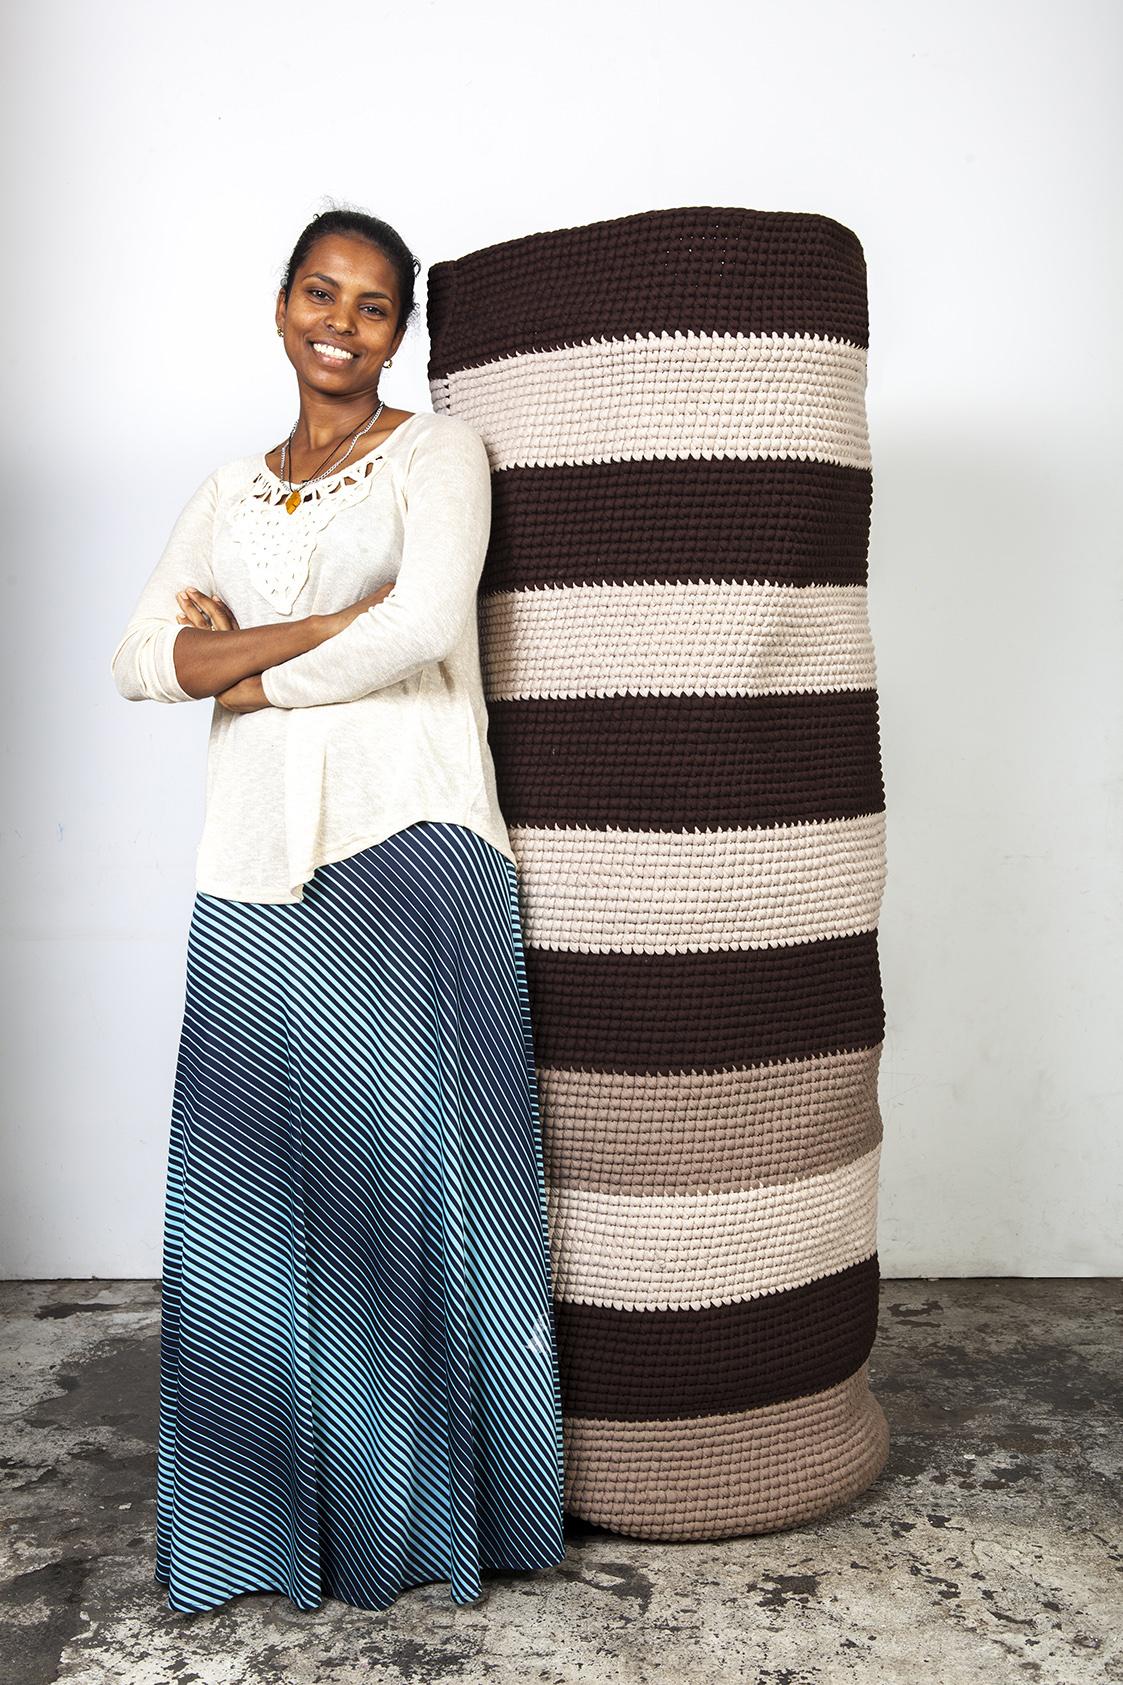 model eritrea art crochet